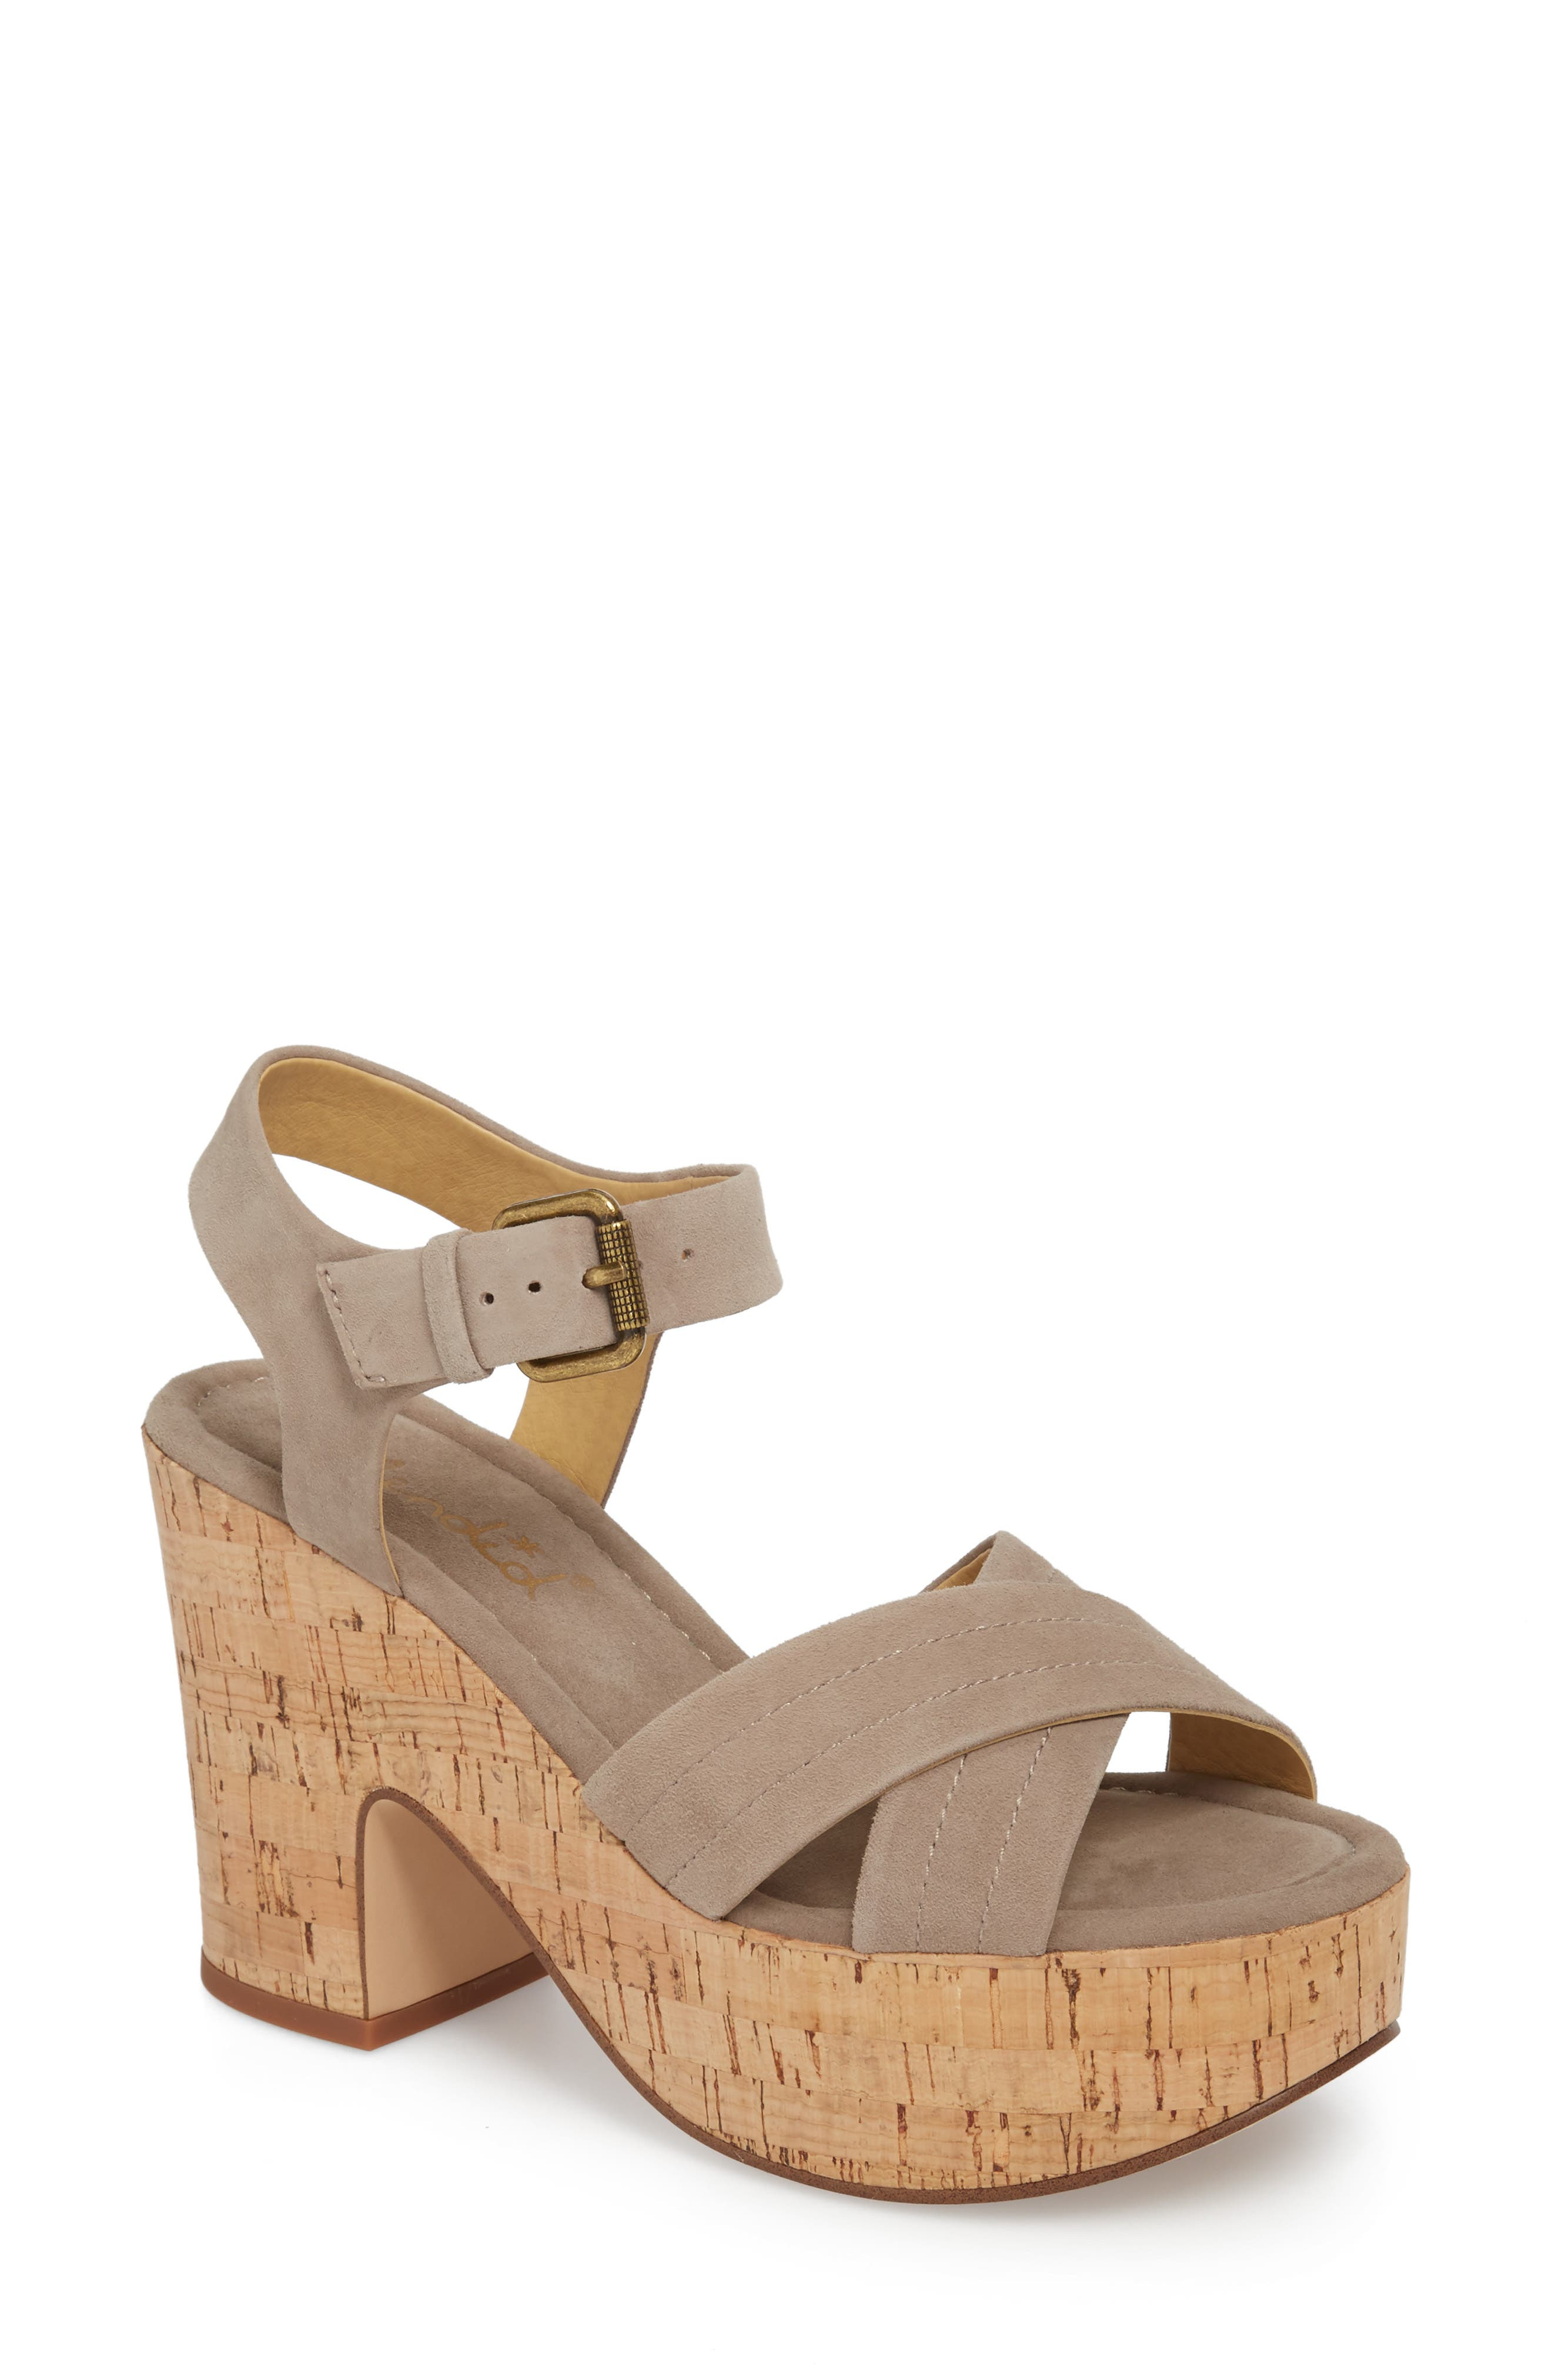 Flaire Platform Sandal,                         Main,                         color, TAUPE SUEDE